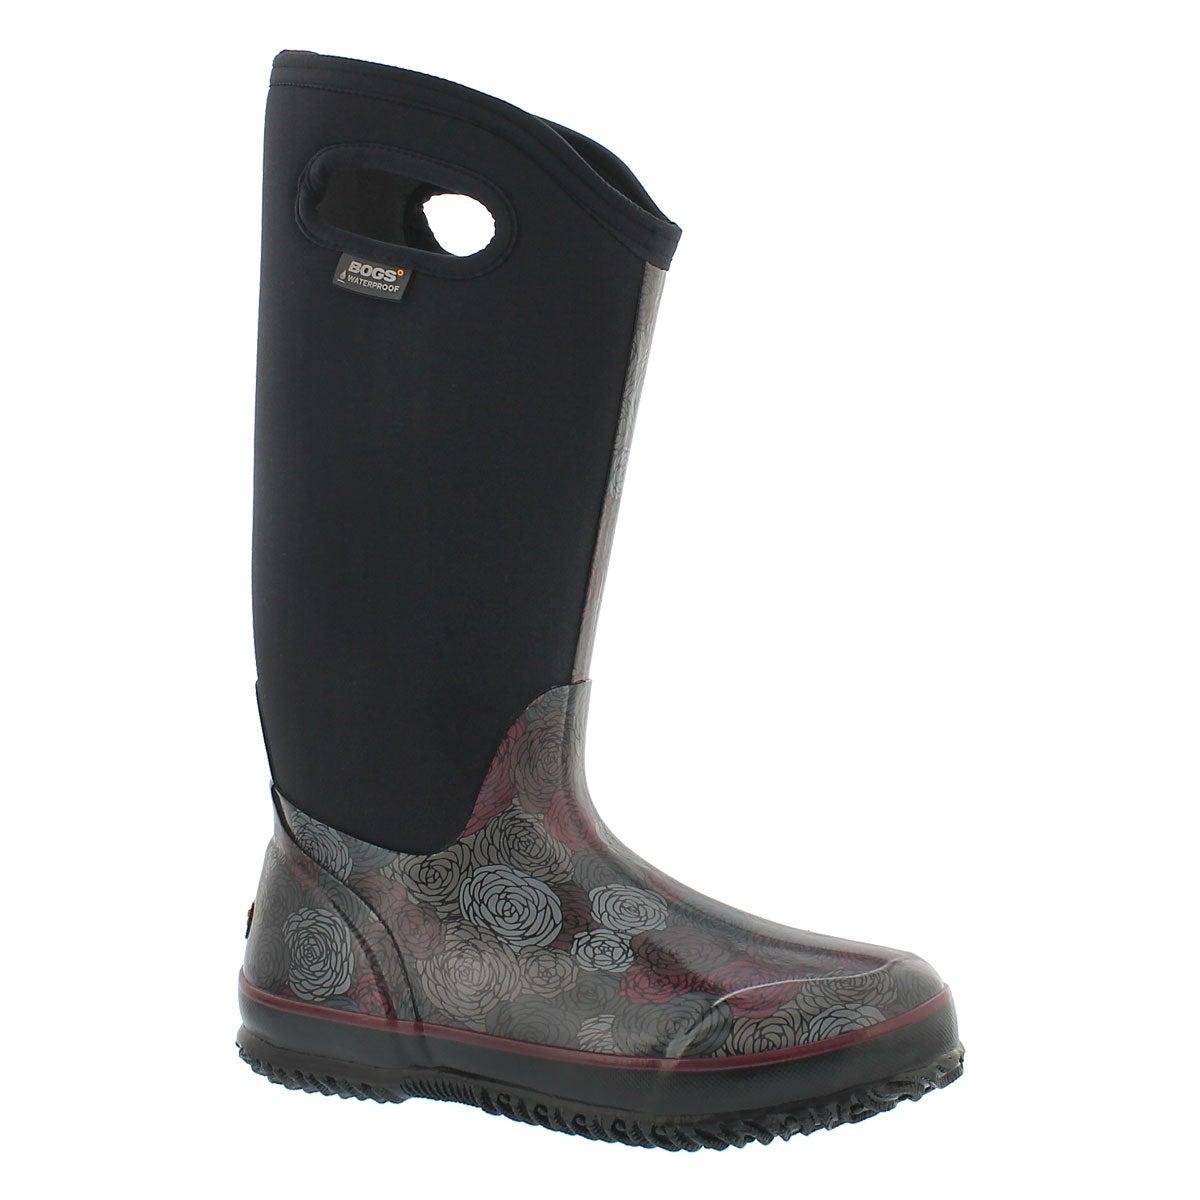 Women's CLASSIC ROSEY TALL black waterproof boots